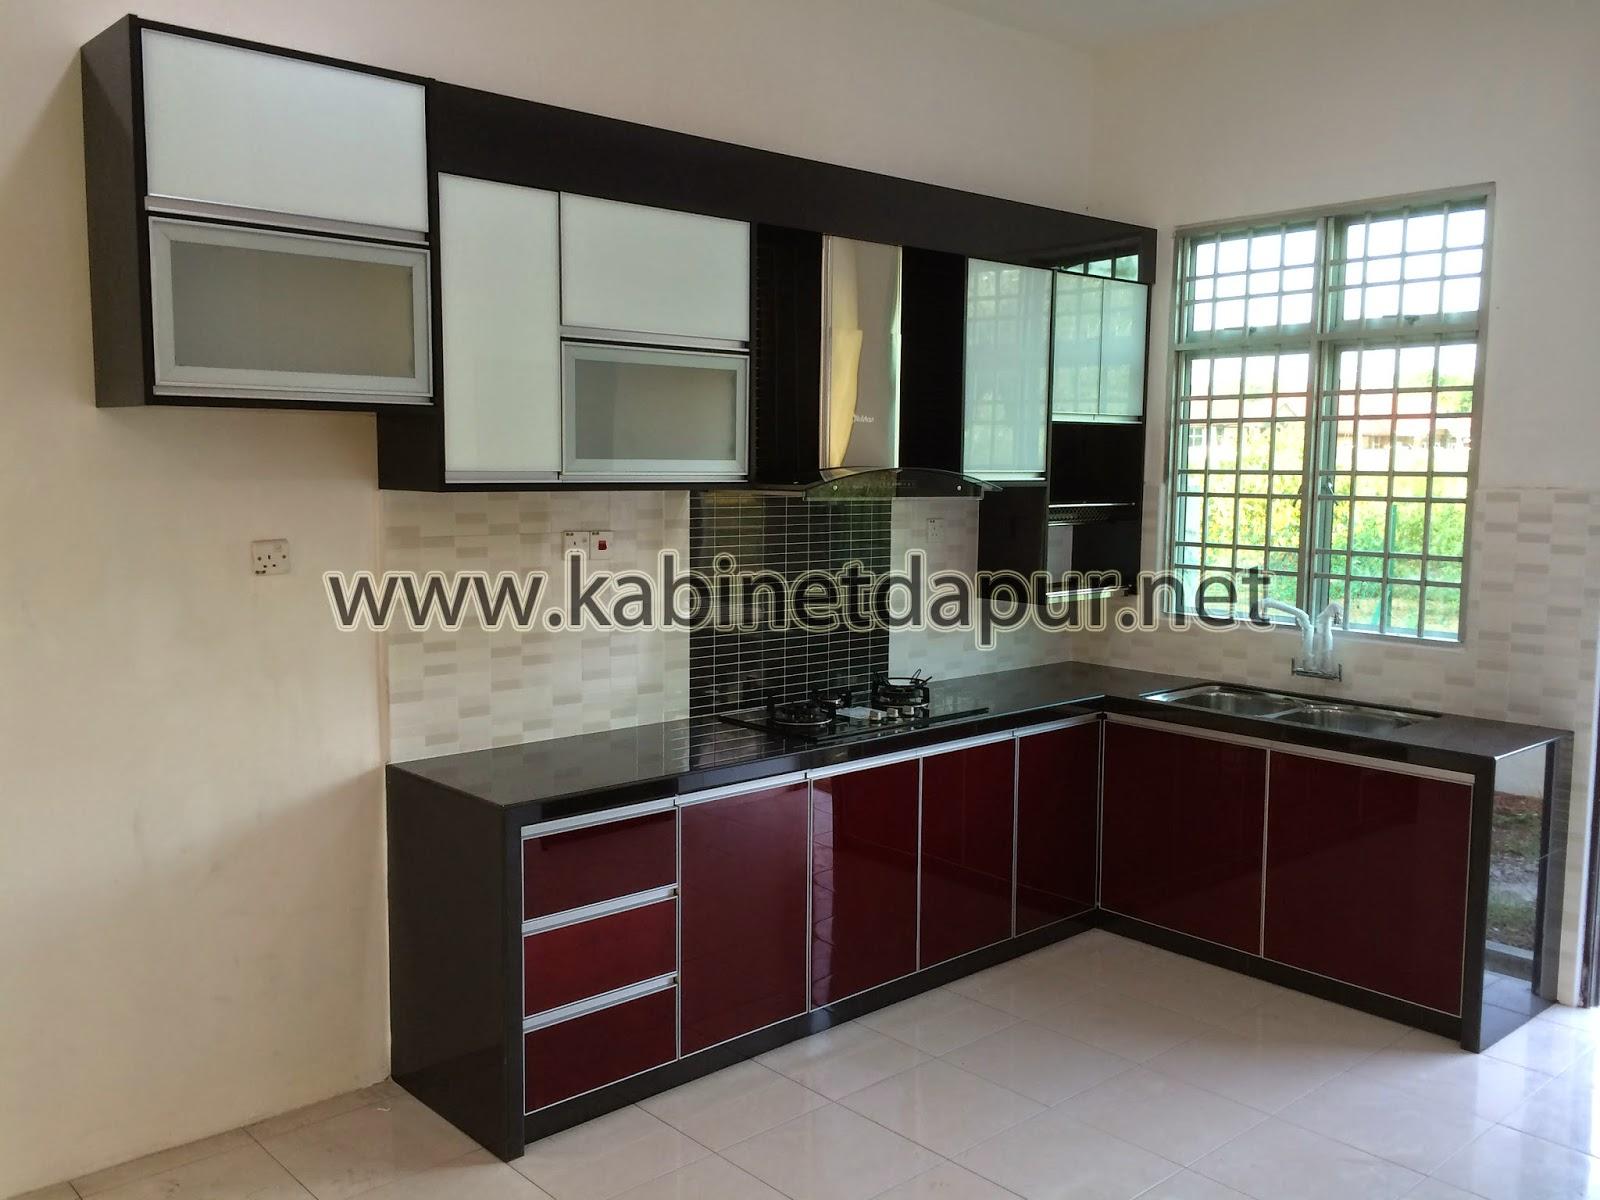 Projek Kabinet Dapur Di 362 Tmn Desa Tanjung Alor Setar